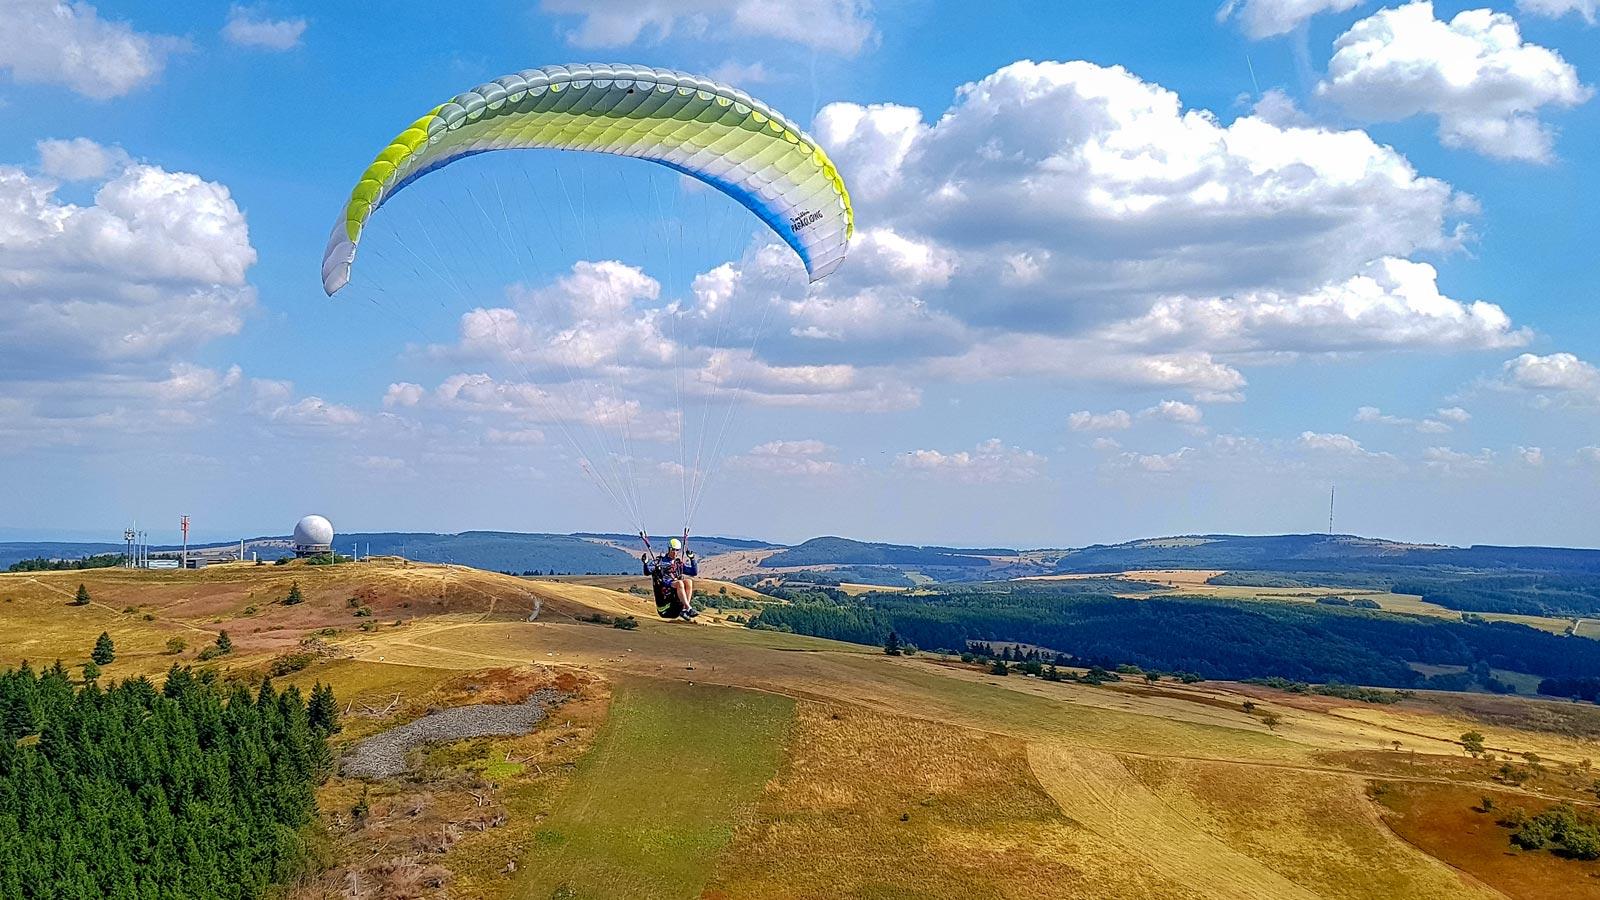 Raqoon EN-A Papillon Paragliders